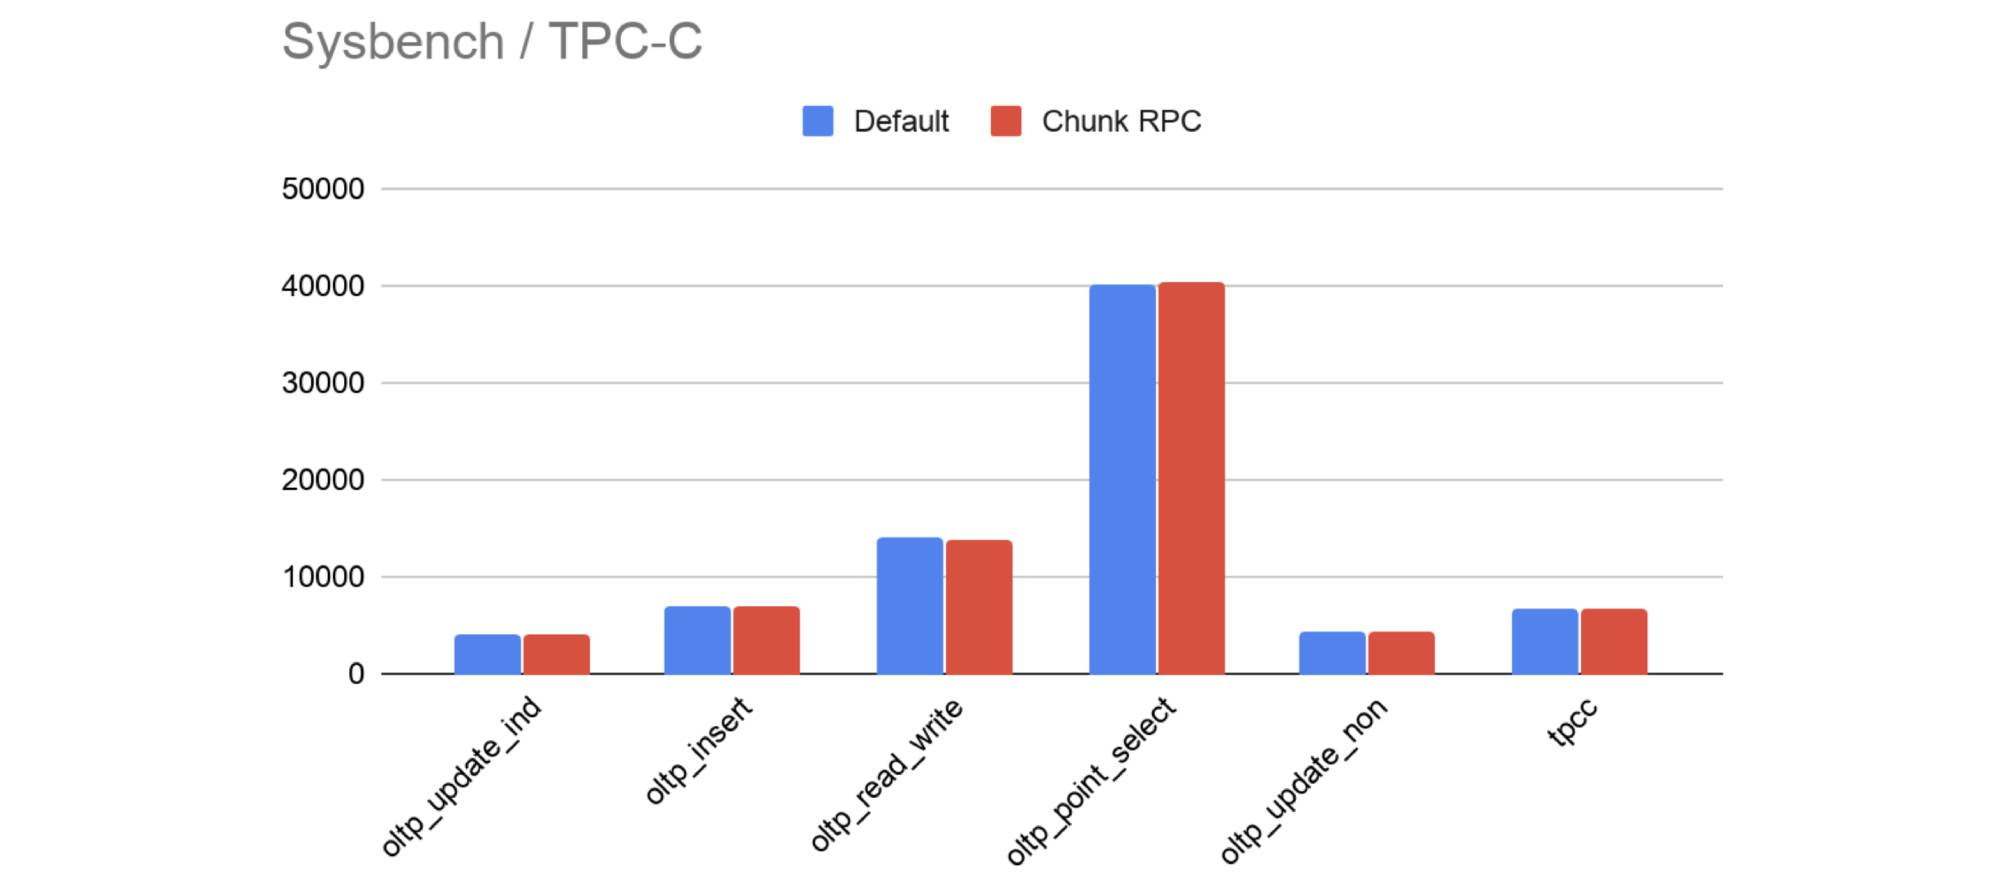 Default encoding vs. Chunk RPC